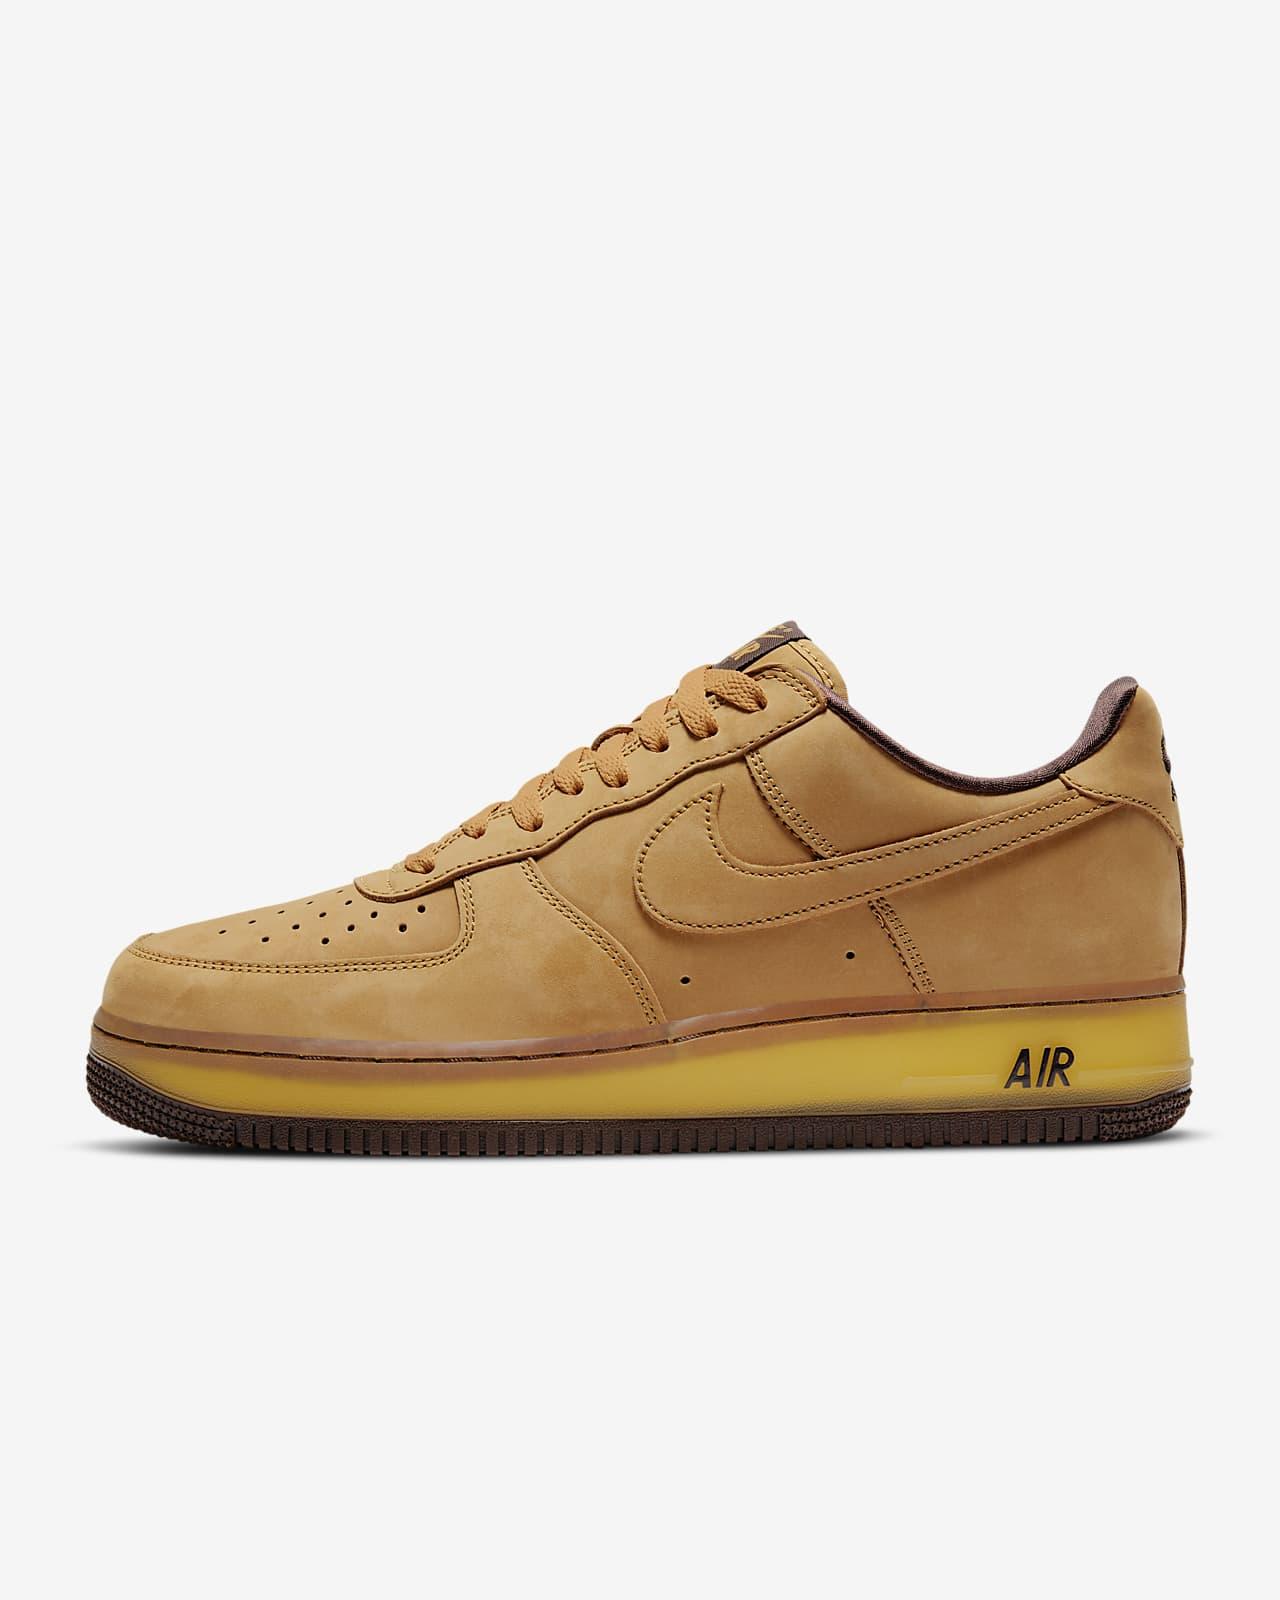 Nike Air Force 1 Low Retro SP Men's Shoe